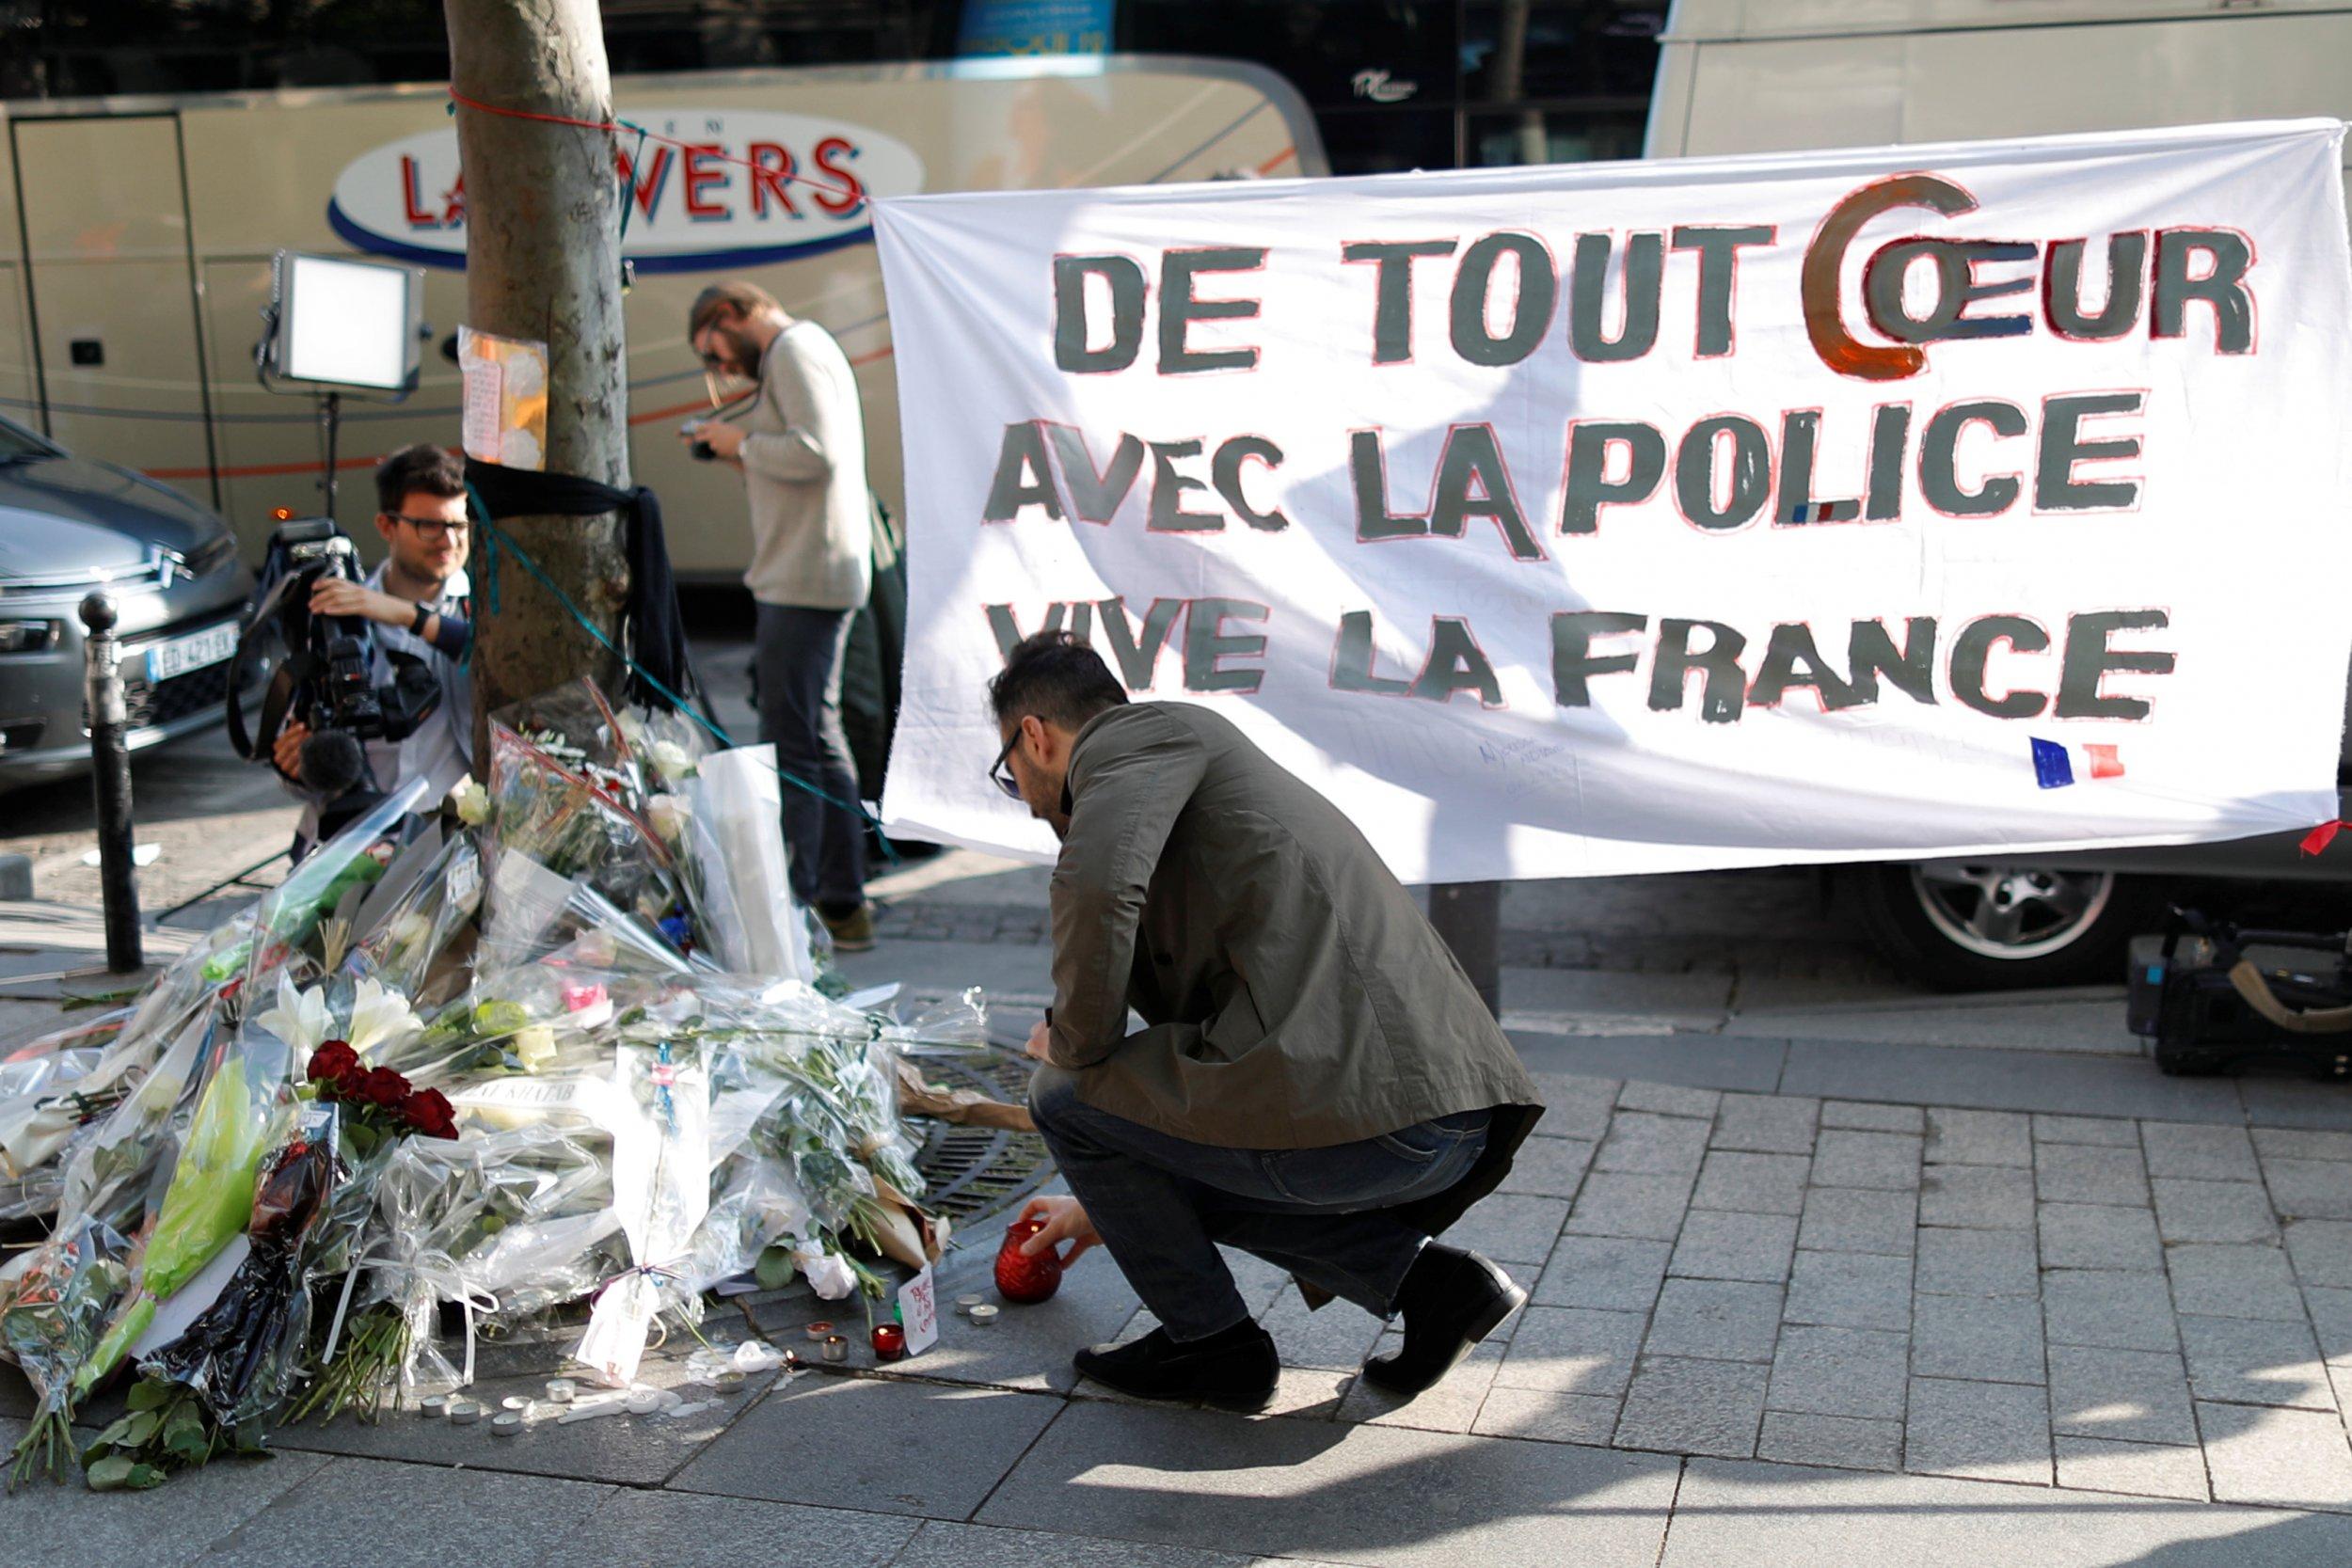 Memorial for the policeman shot on the Champs-Élysées